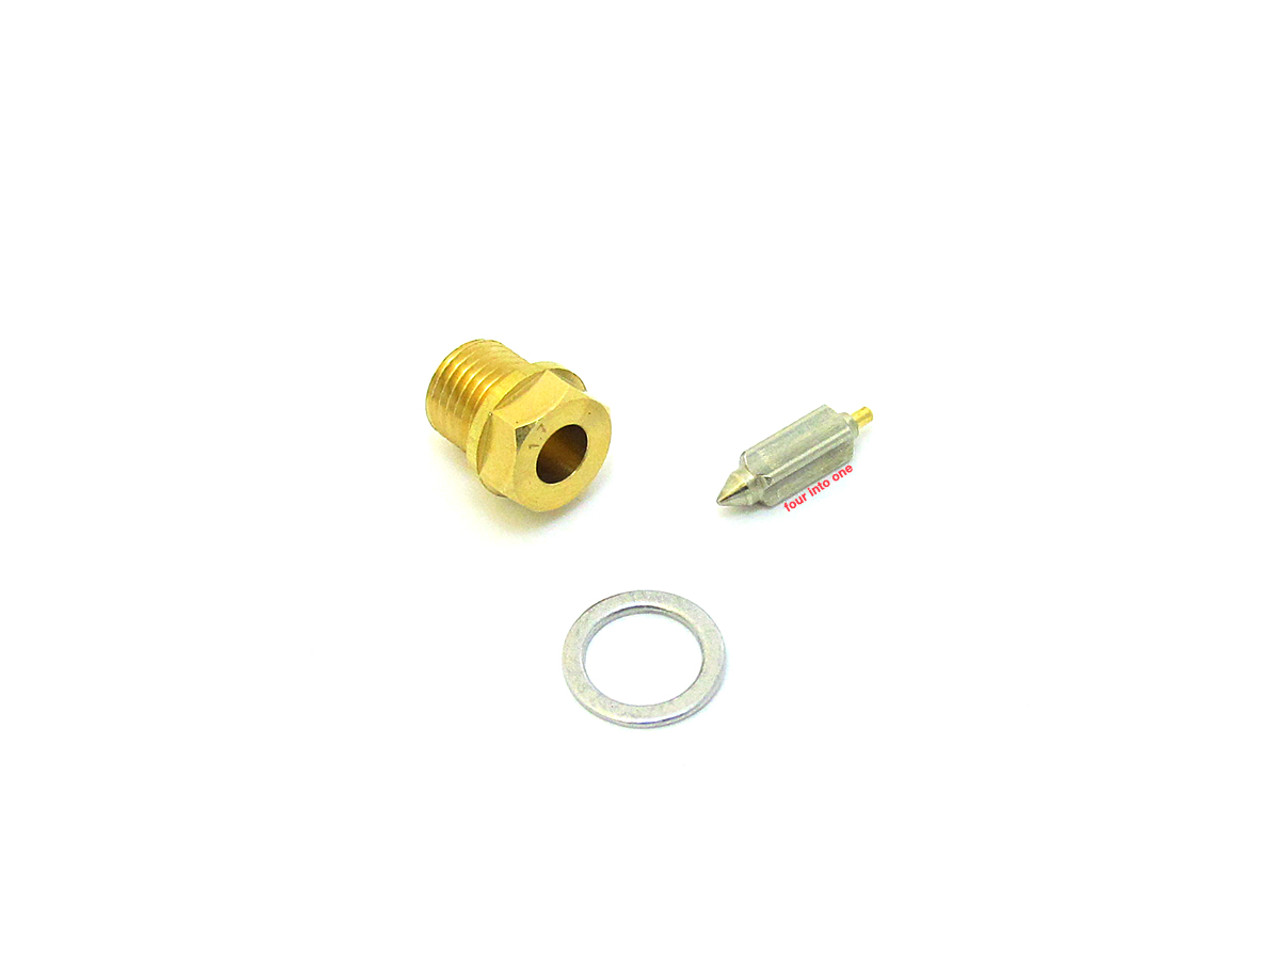 16011-375-004 Genuine Honda 2.5 Float Needle Valve Assembly CB100 CB125 CB72